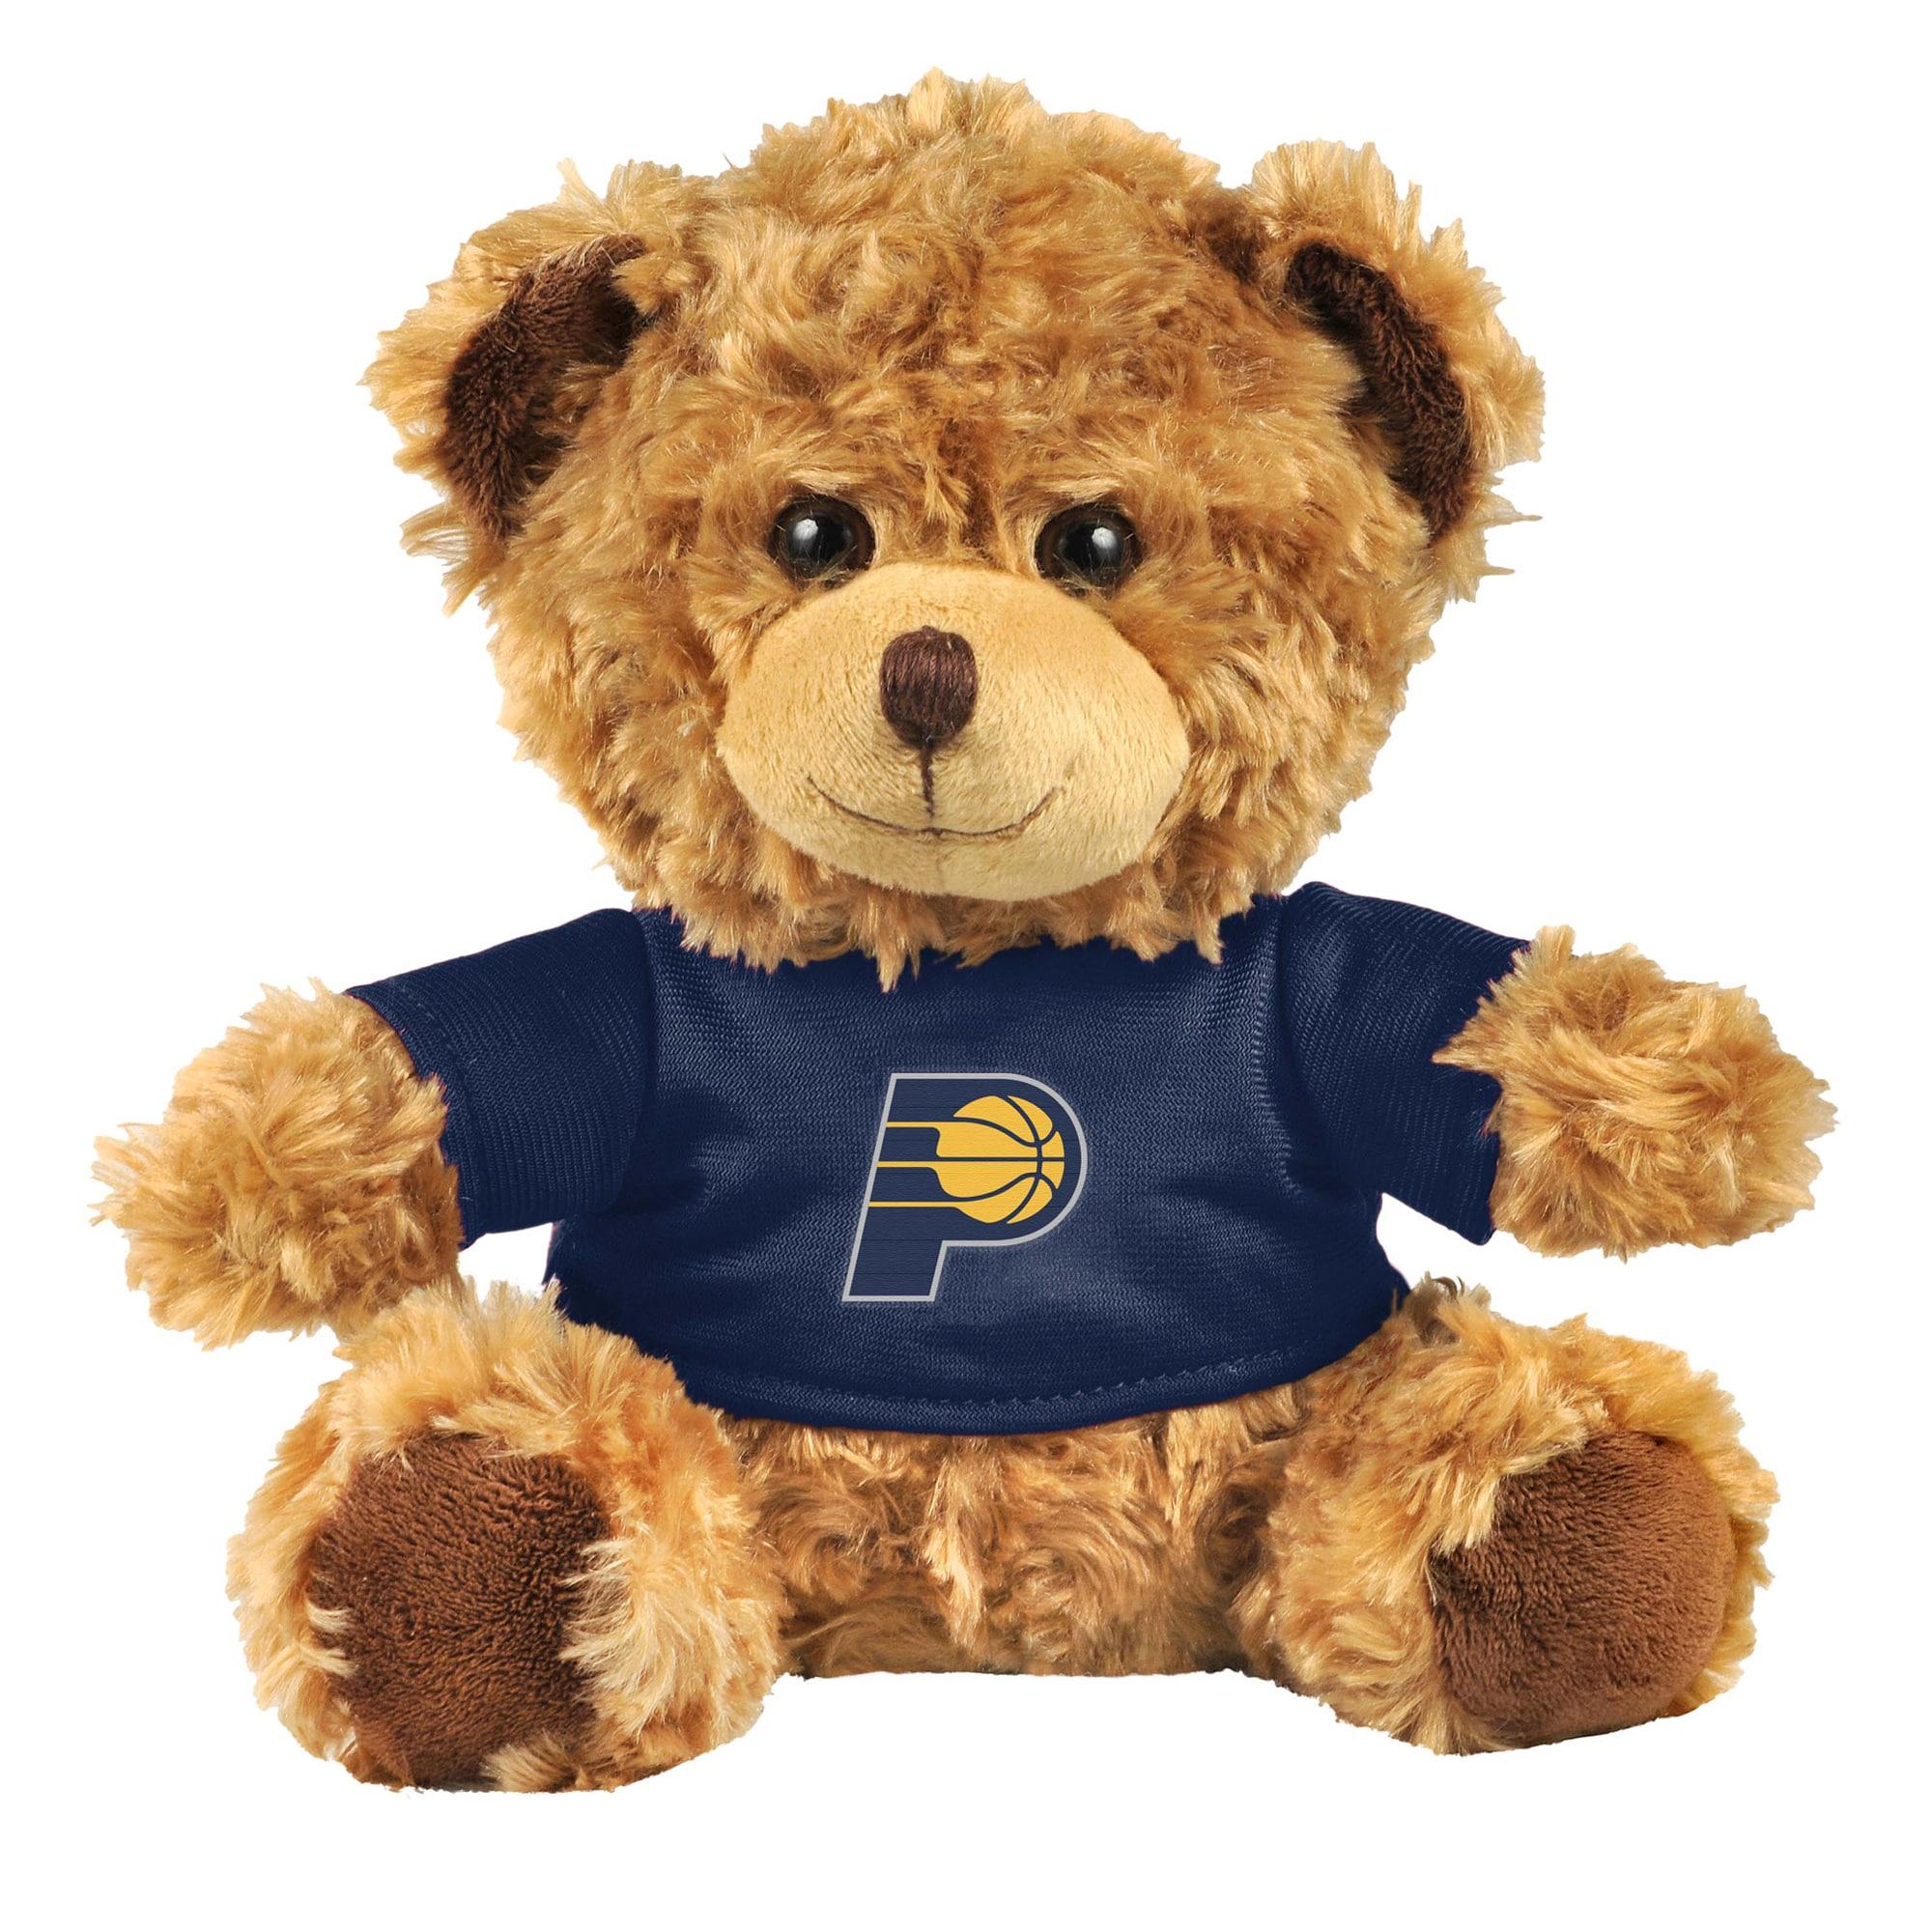 Indiana Pacers Team Shirt Bear